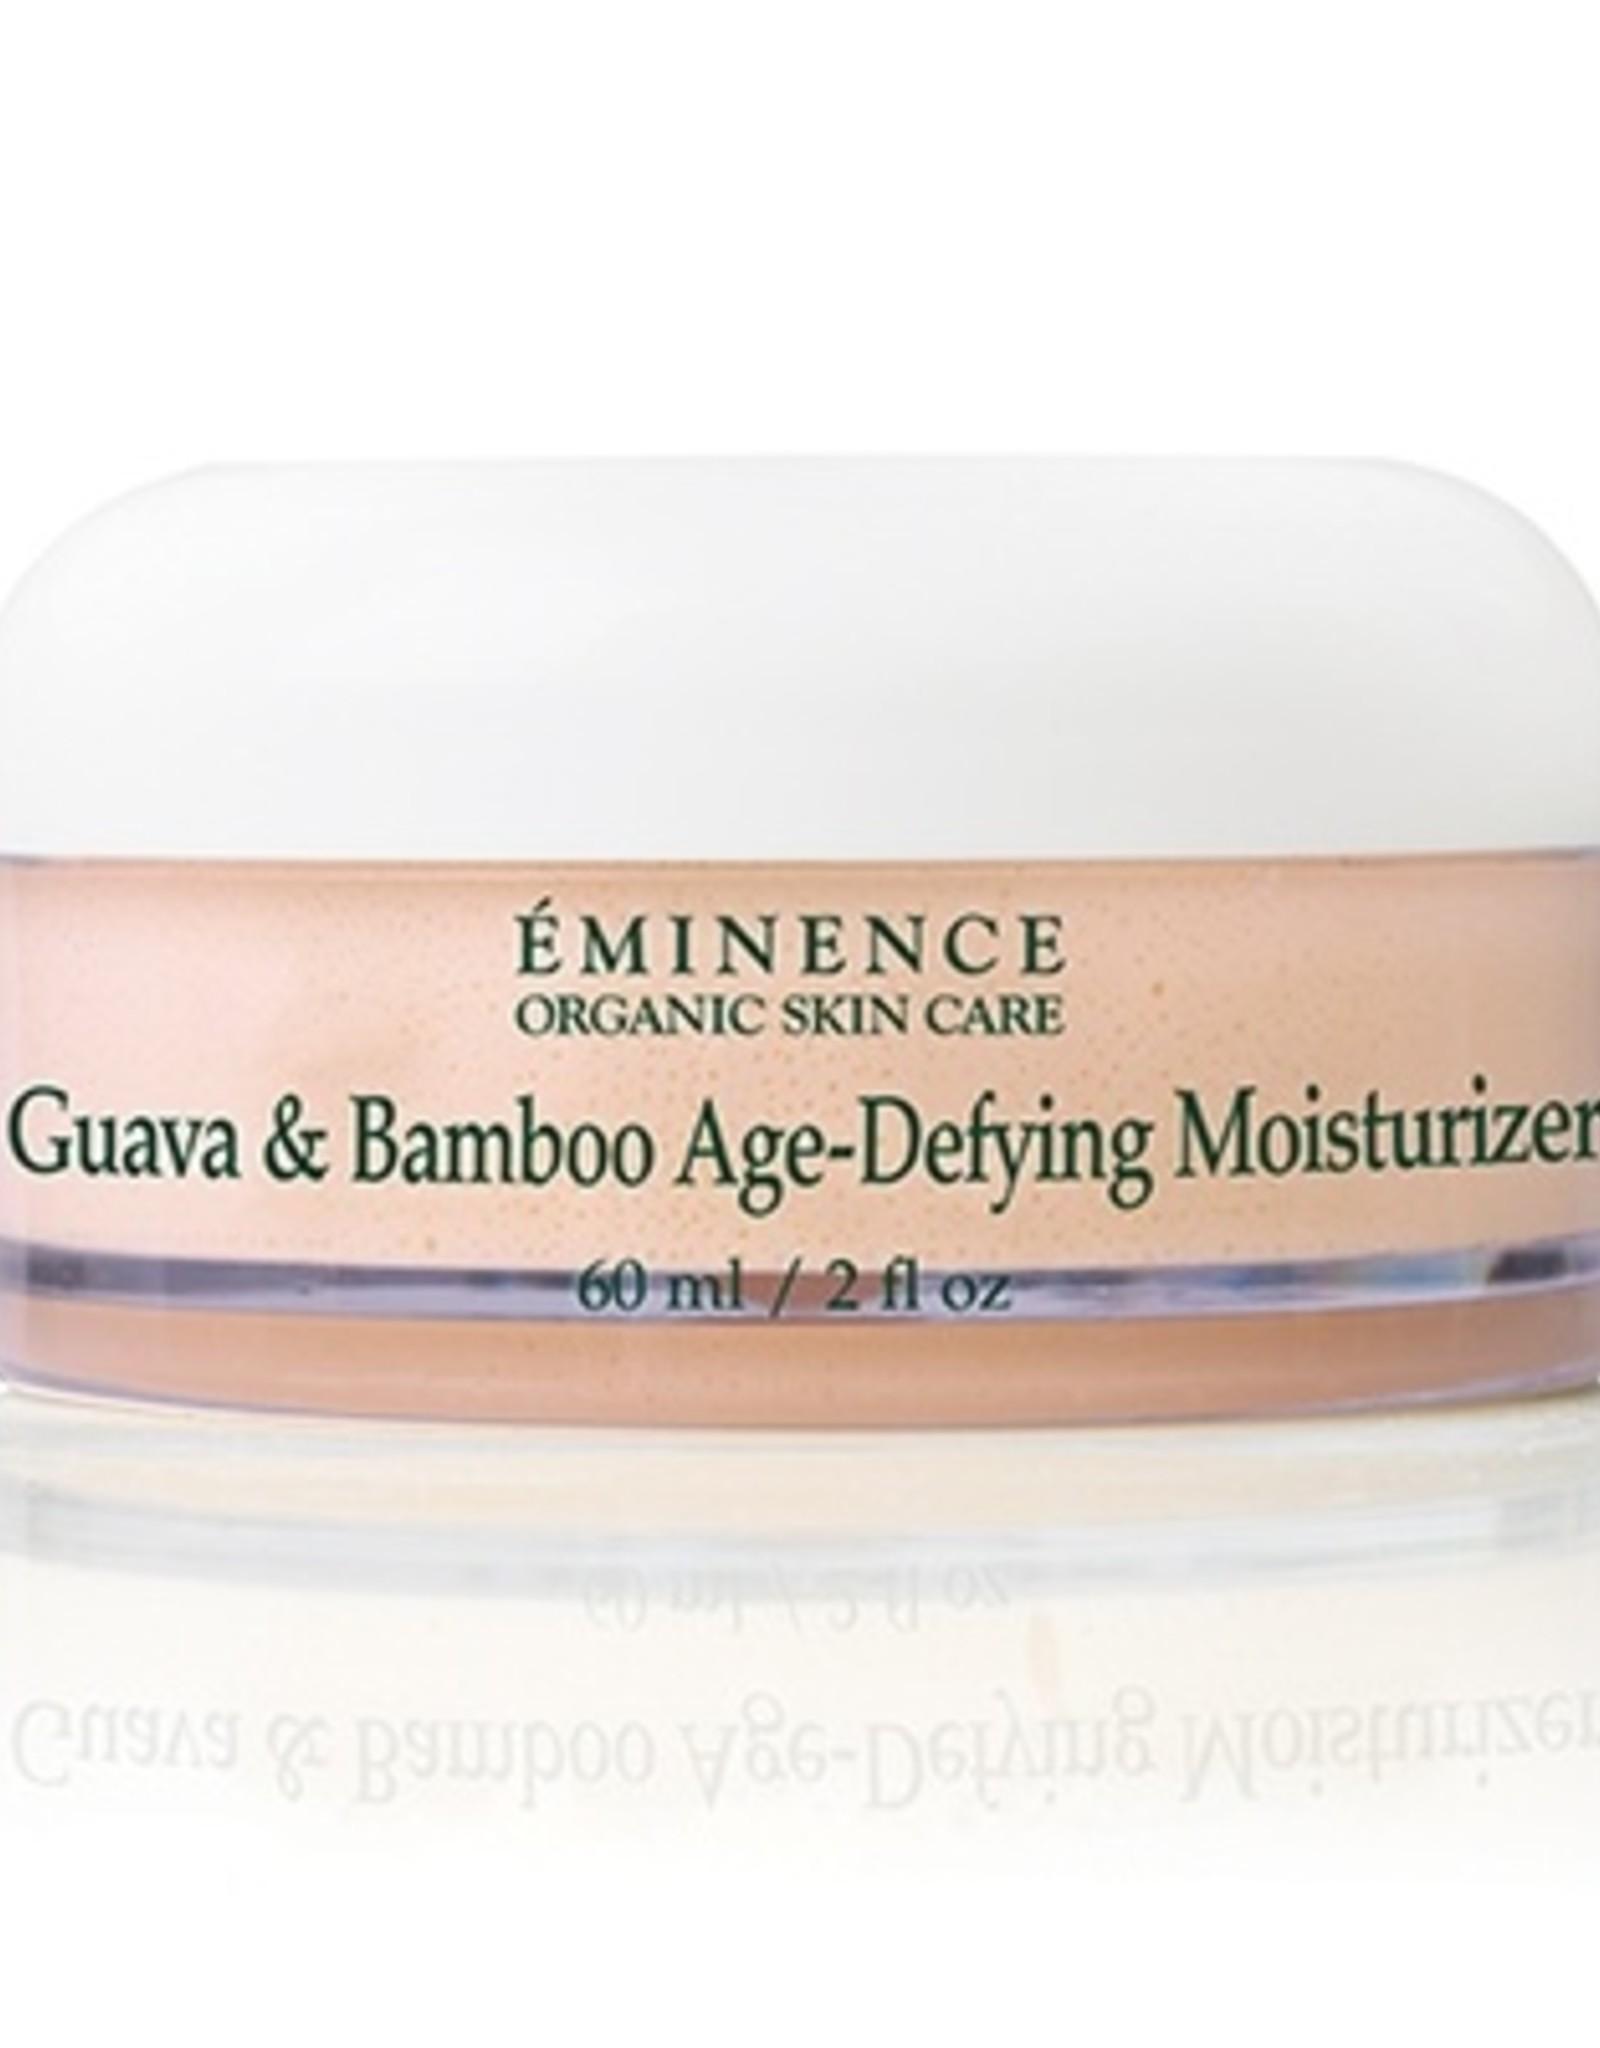 Eminence Organic Skin Care Guava & Bamboo Age-Defying Moisturizer*